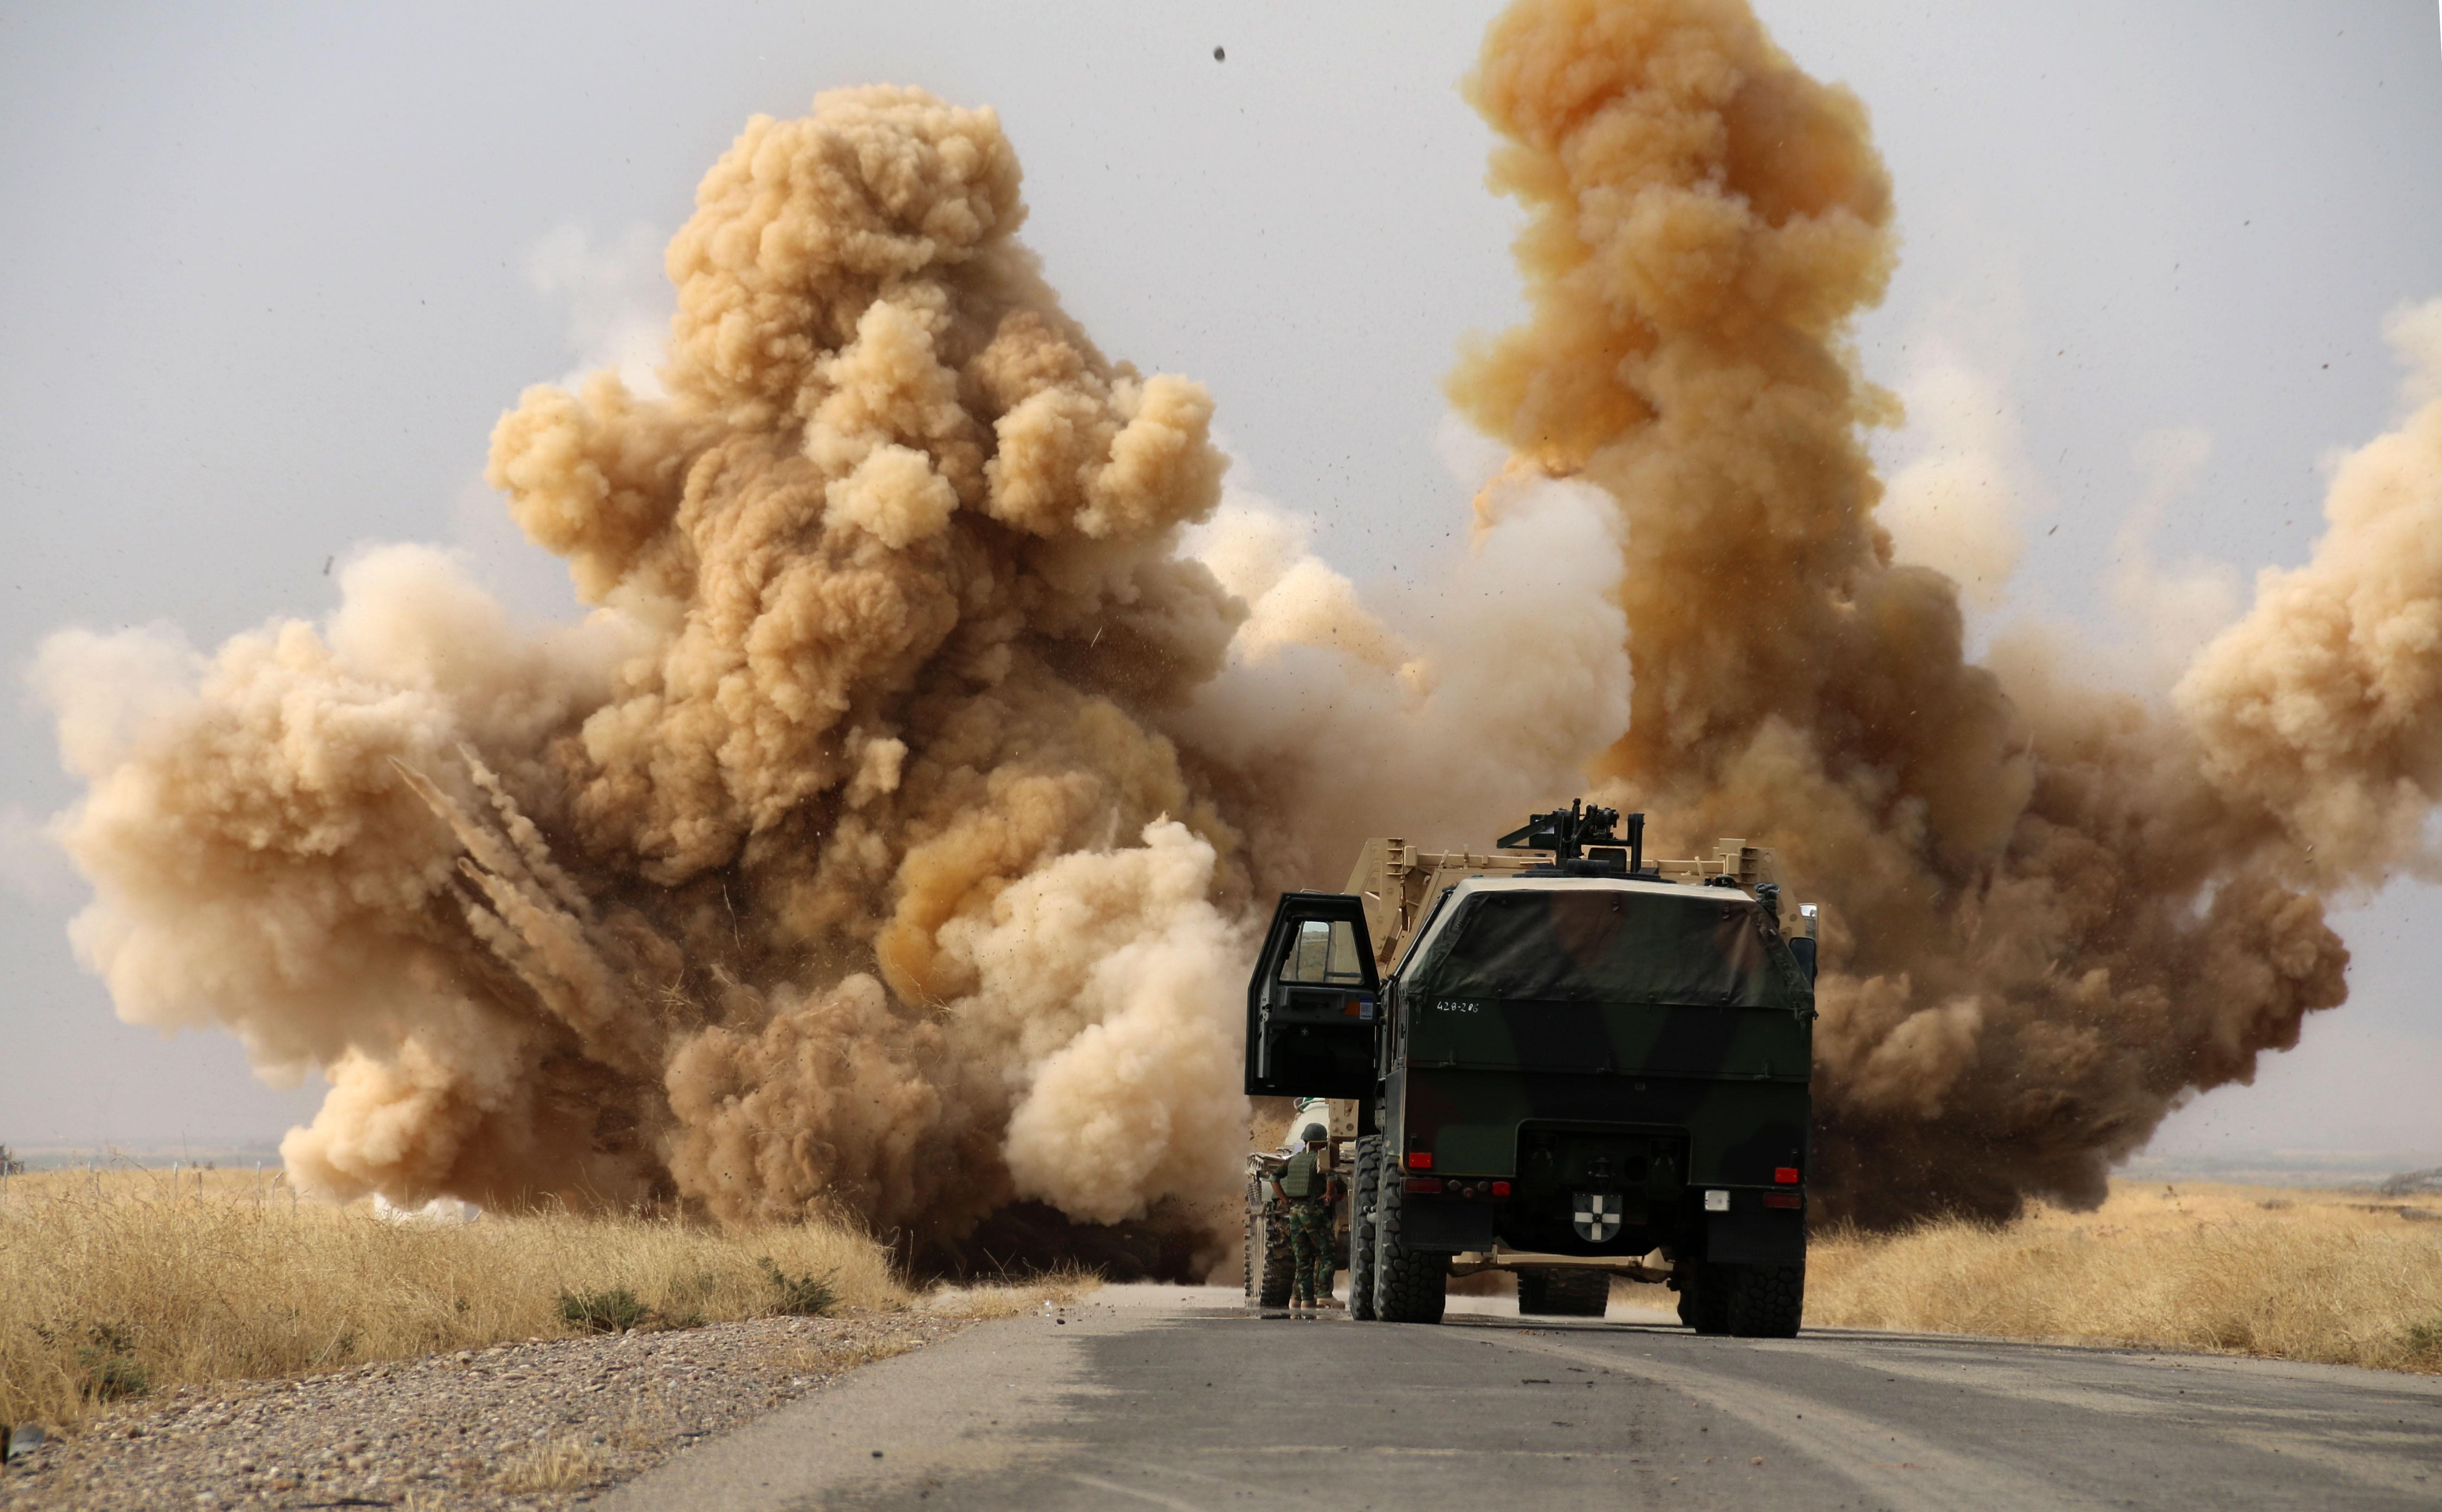 Kurdish peshmerga forces detonate improvised explosive devices placed by ISIS on a road outside the northern Iraq city of Kirkuk on Wednesday.